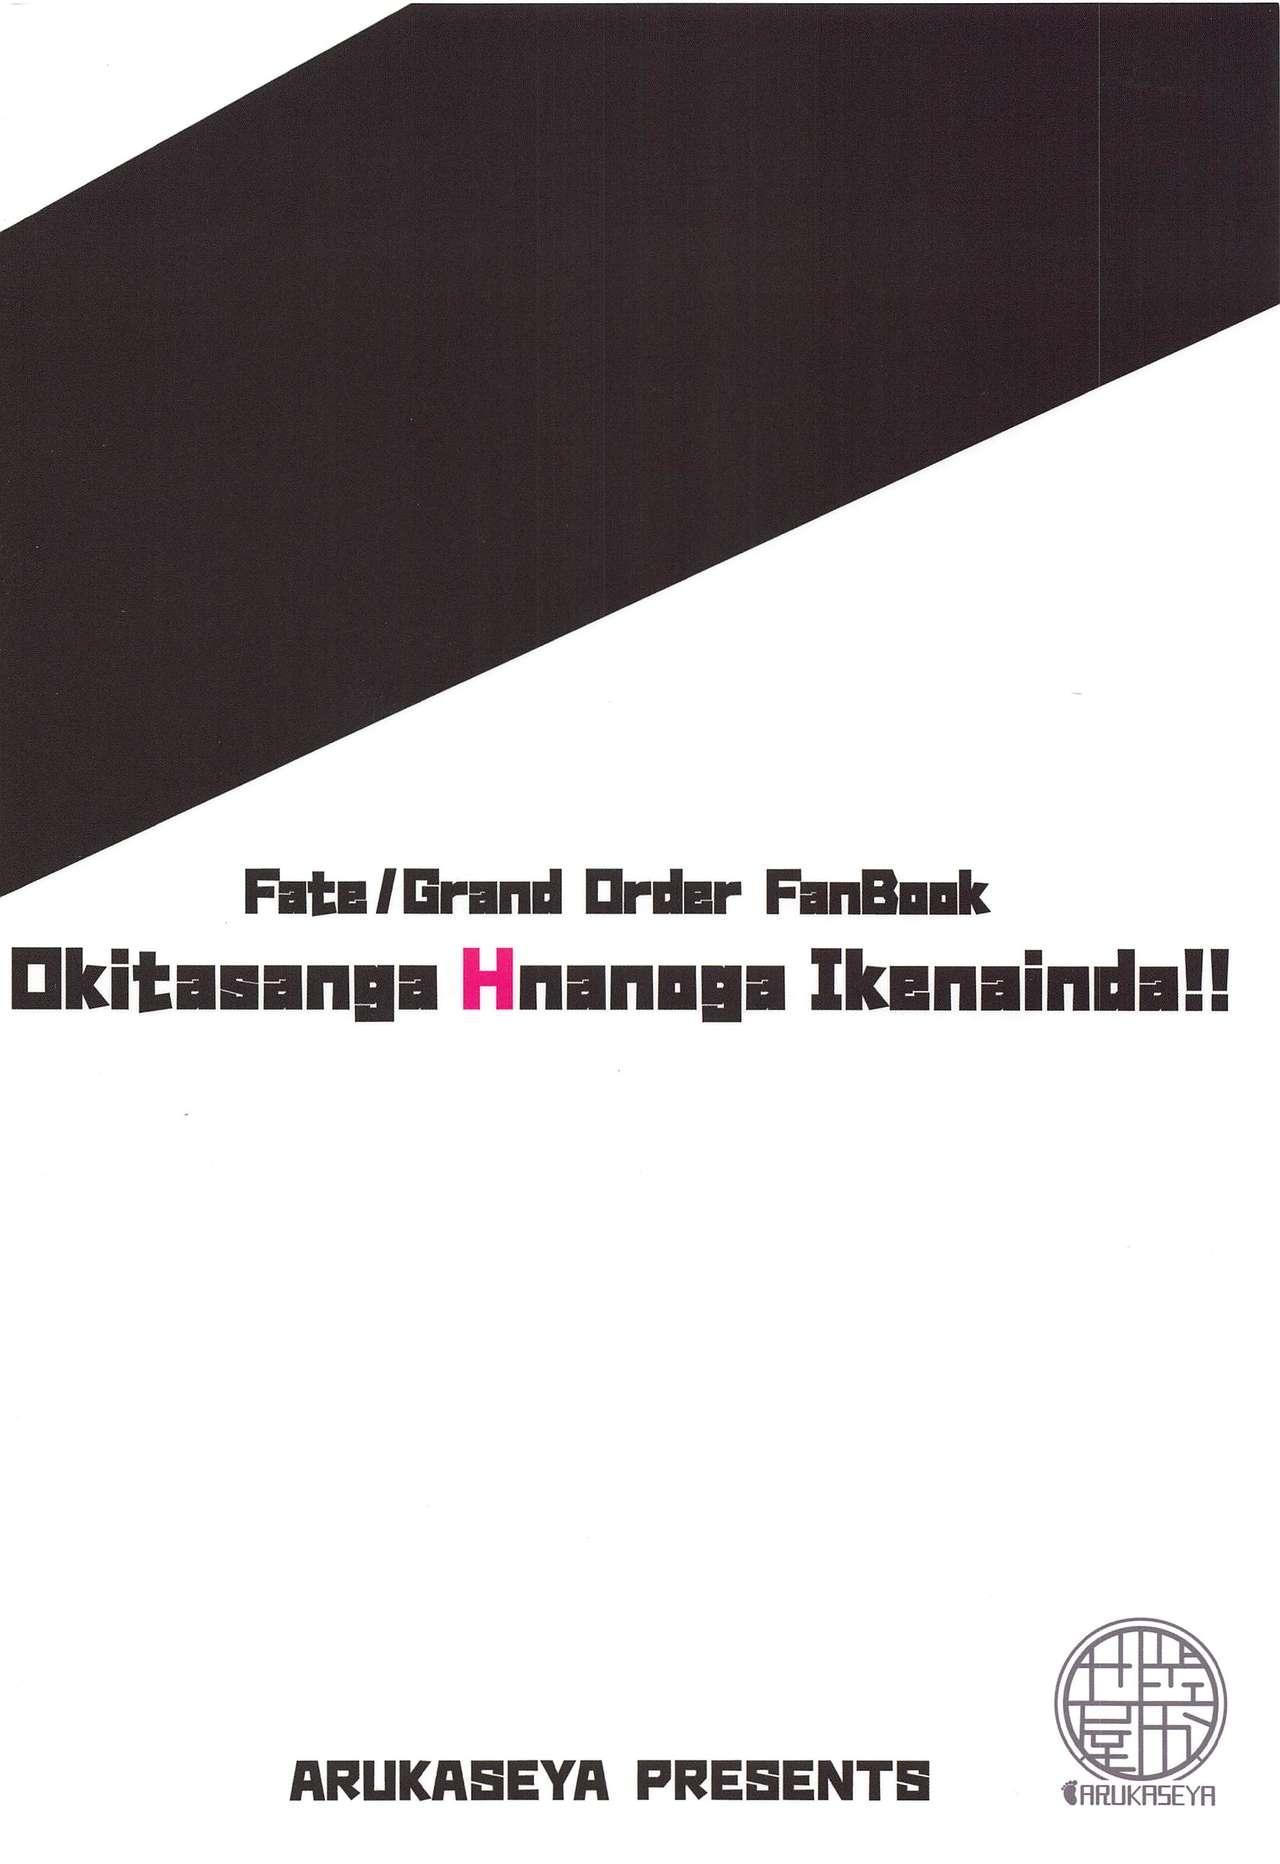 Okitasanga Hnanoga Ikenainda!! 22